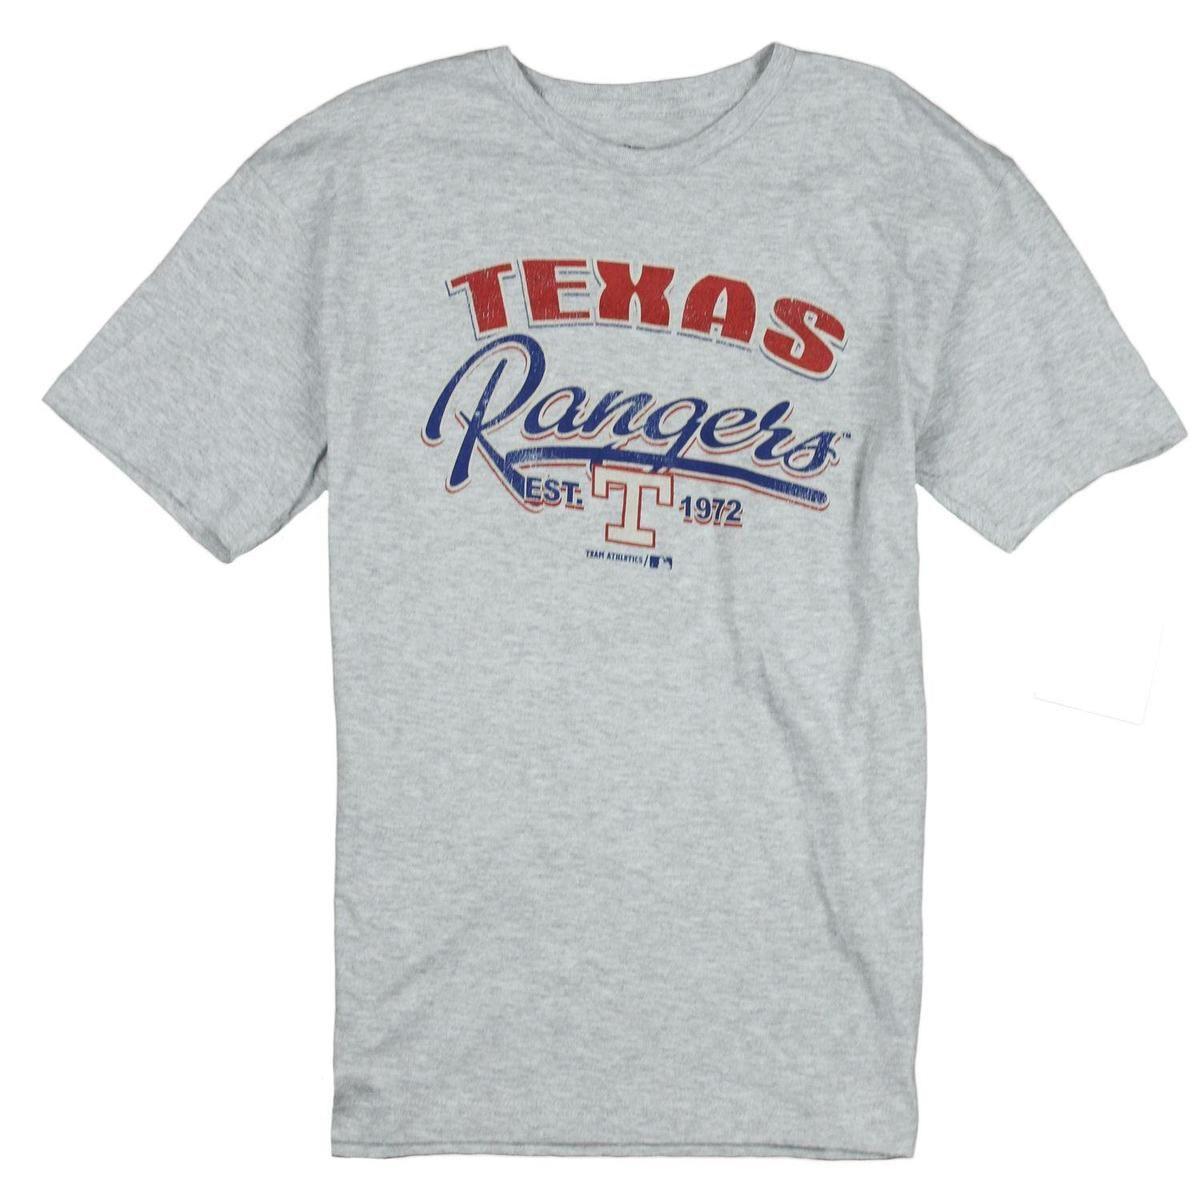 86efbb3b85a Baseball Youth Boys Vintage Graphic Tee T Shirt